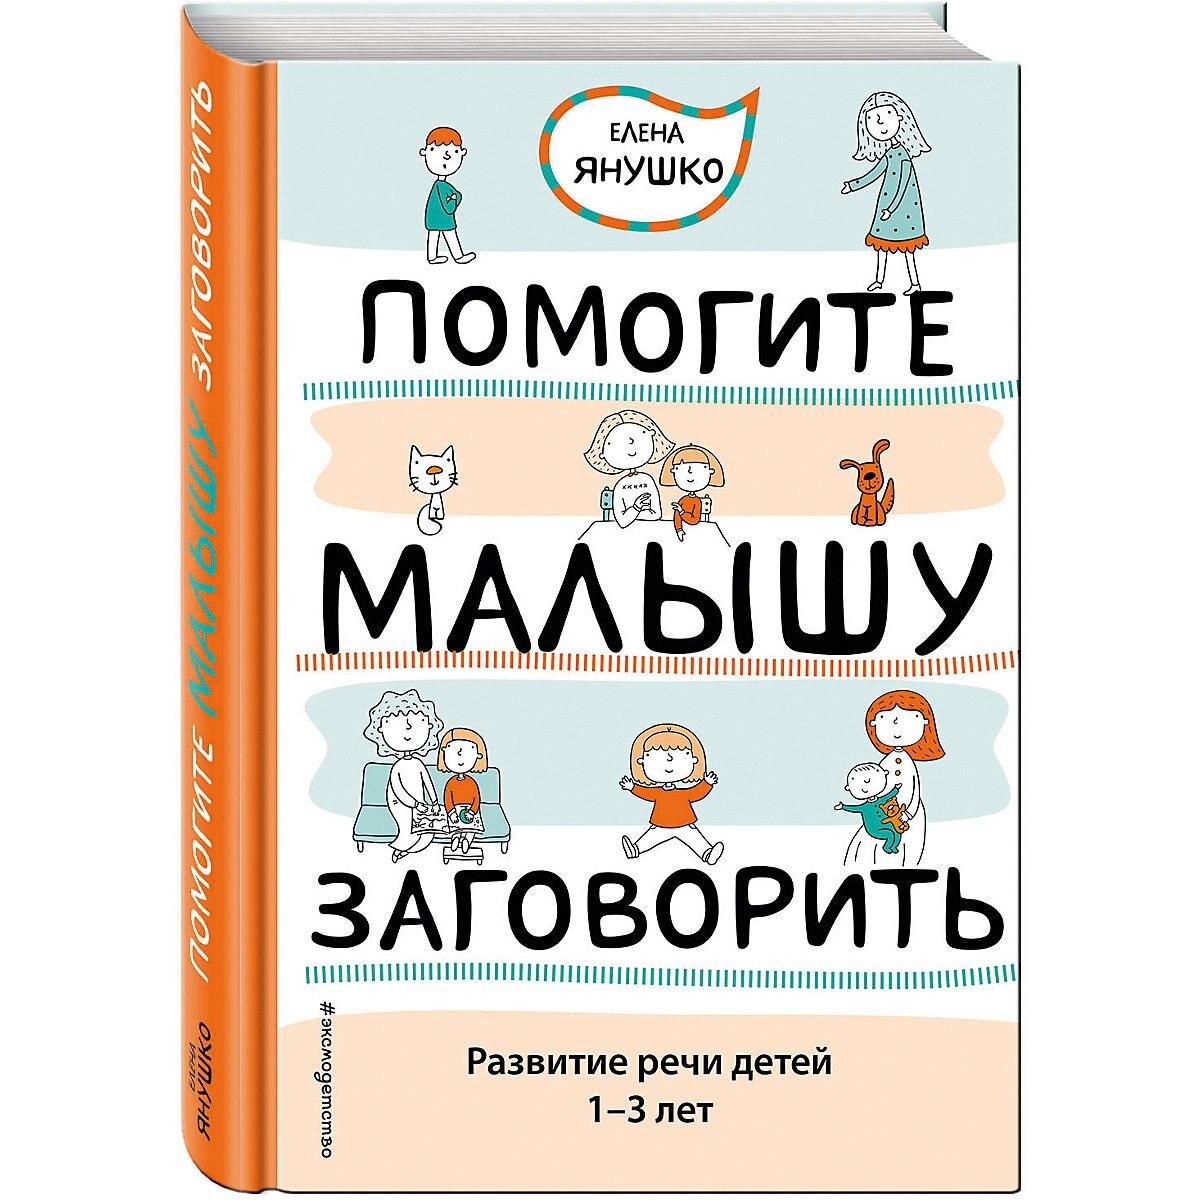 Books EKSMO 4414973 Children Education Encyclopedia Alphabet Dictionary Book For Baby